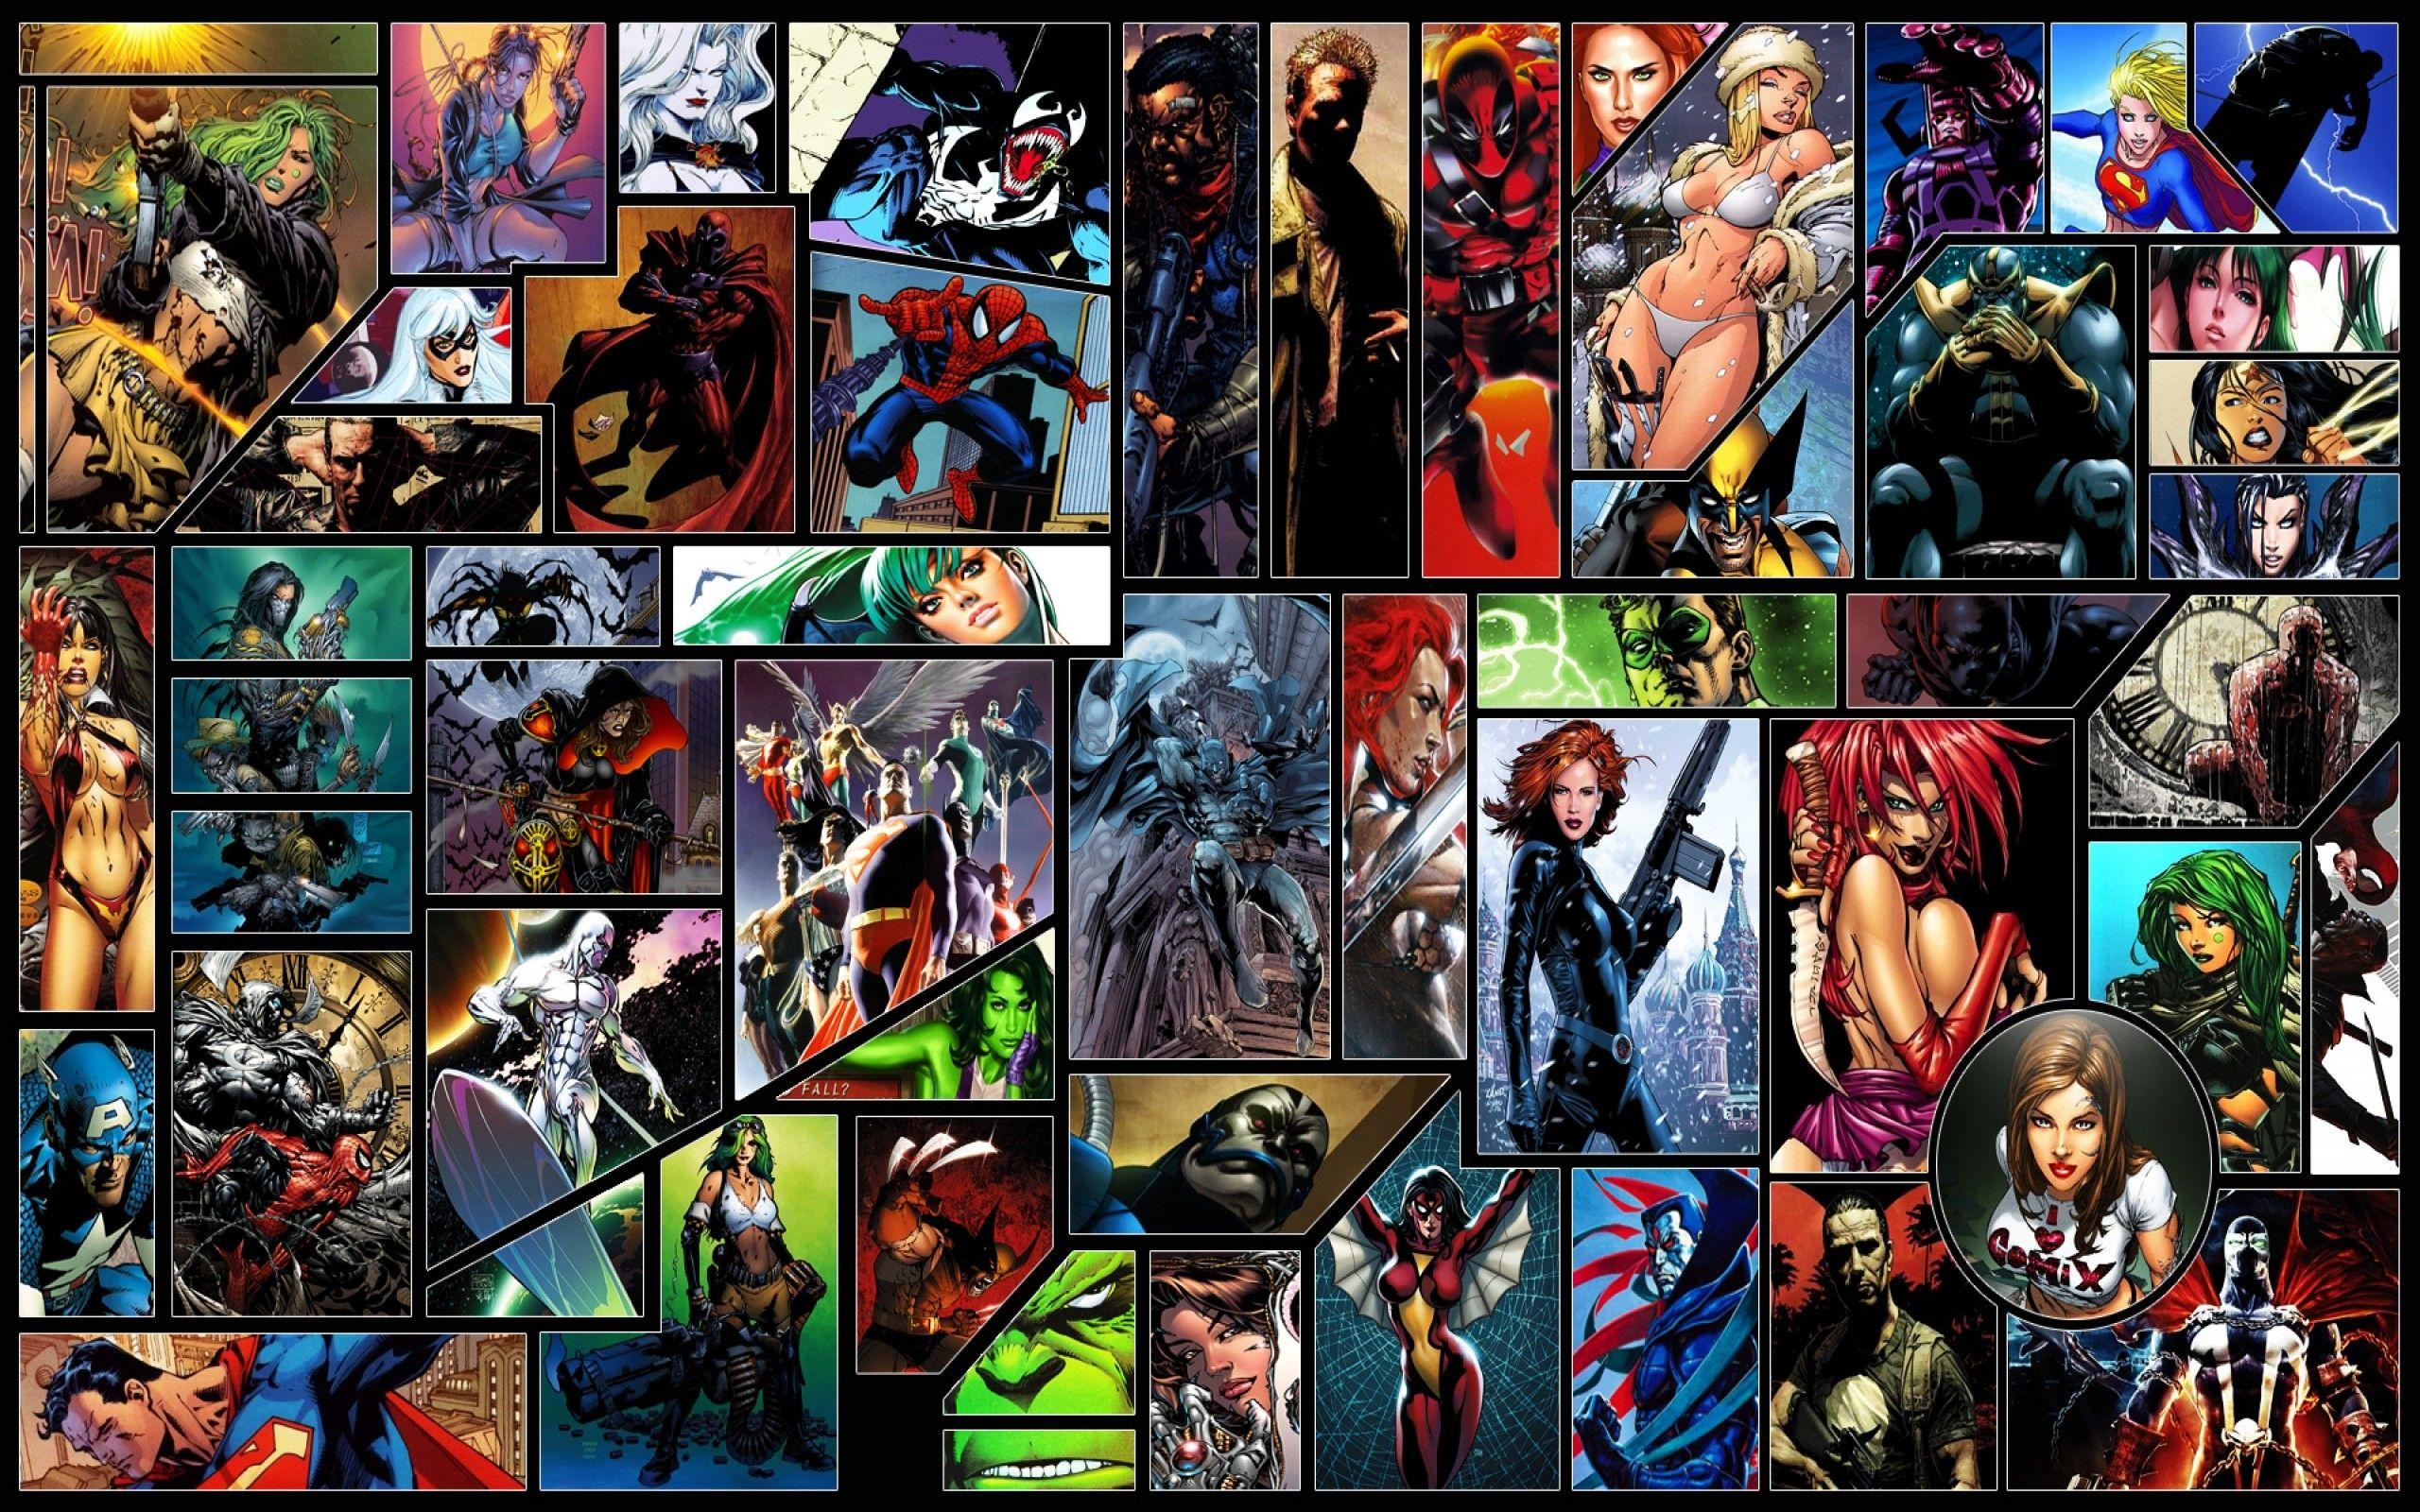 marvel dc superheroes wallpaper | hd wallpapers | pinterest | wallpaper